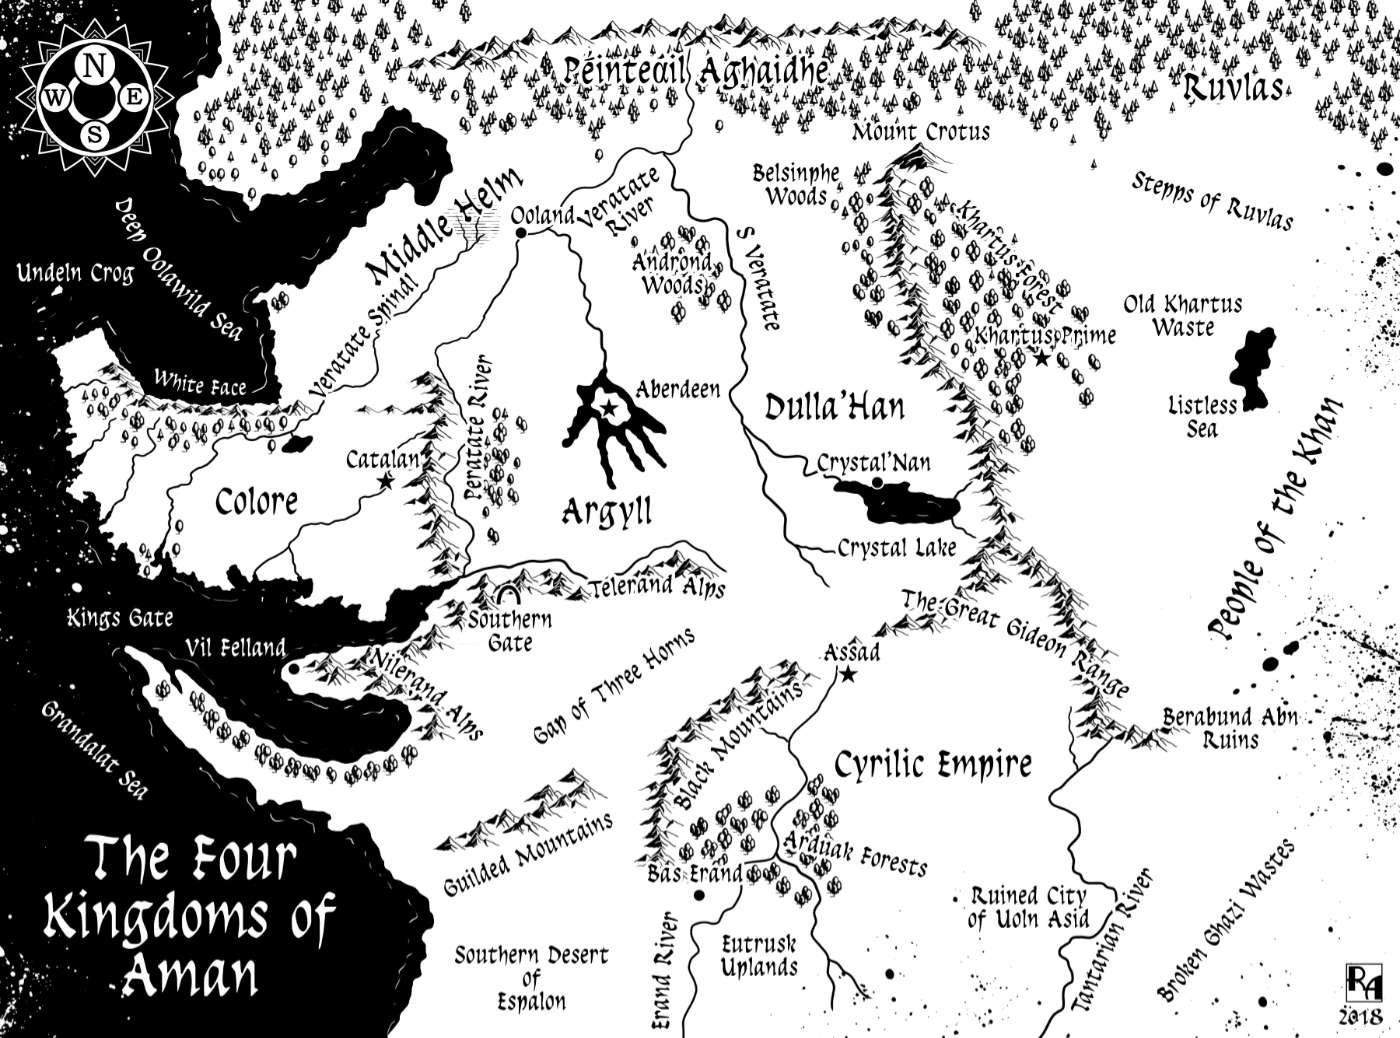 Robert altbauer aman fantasy map